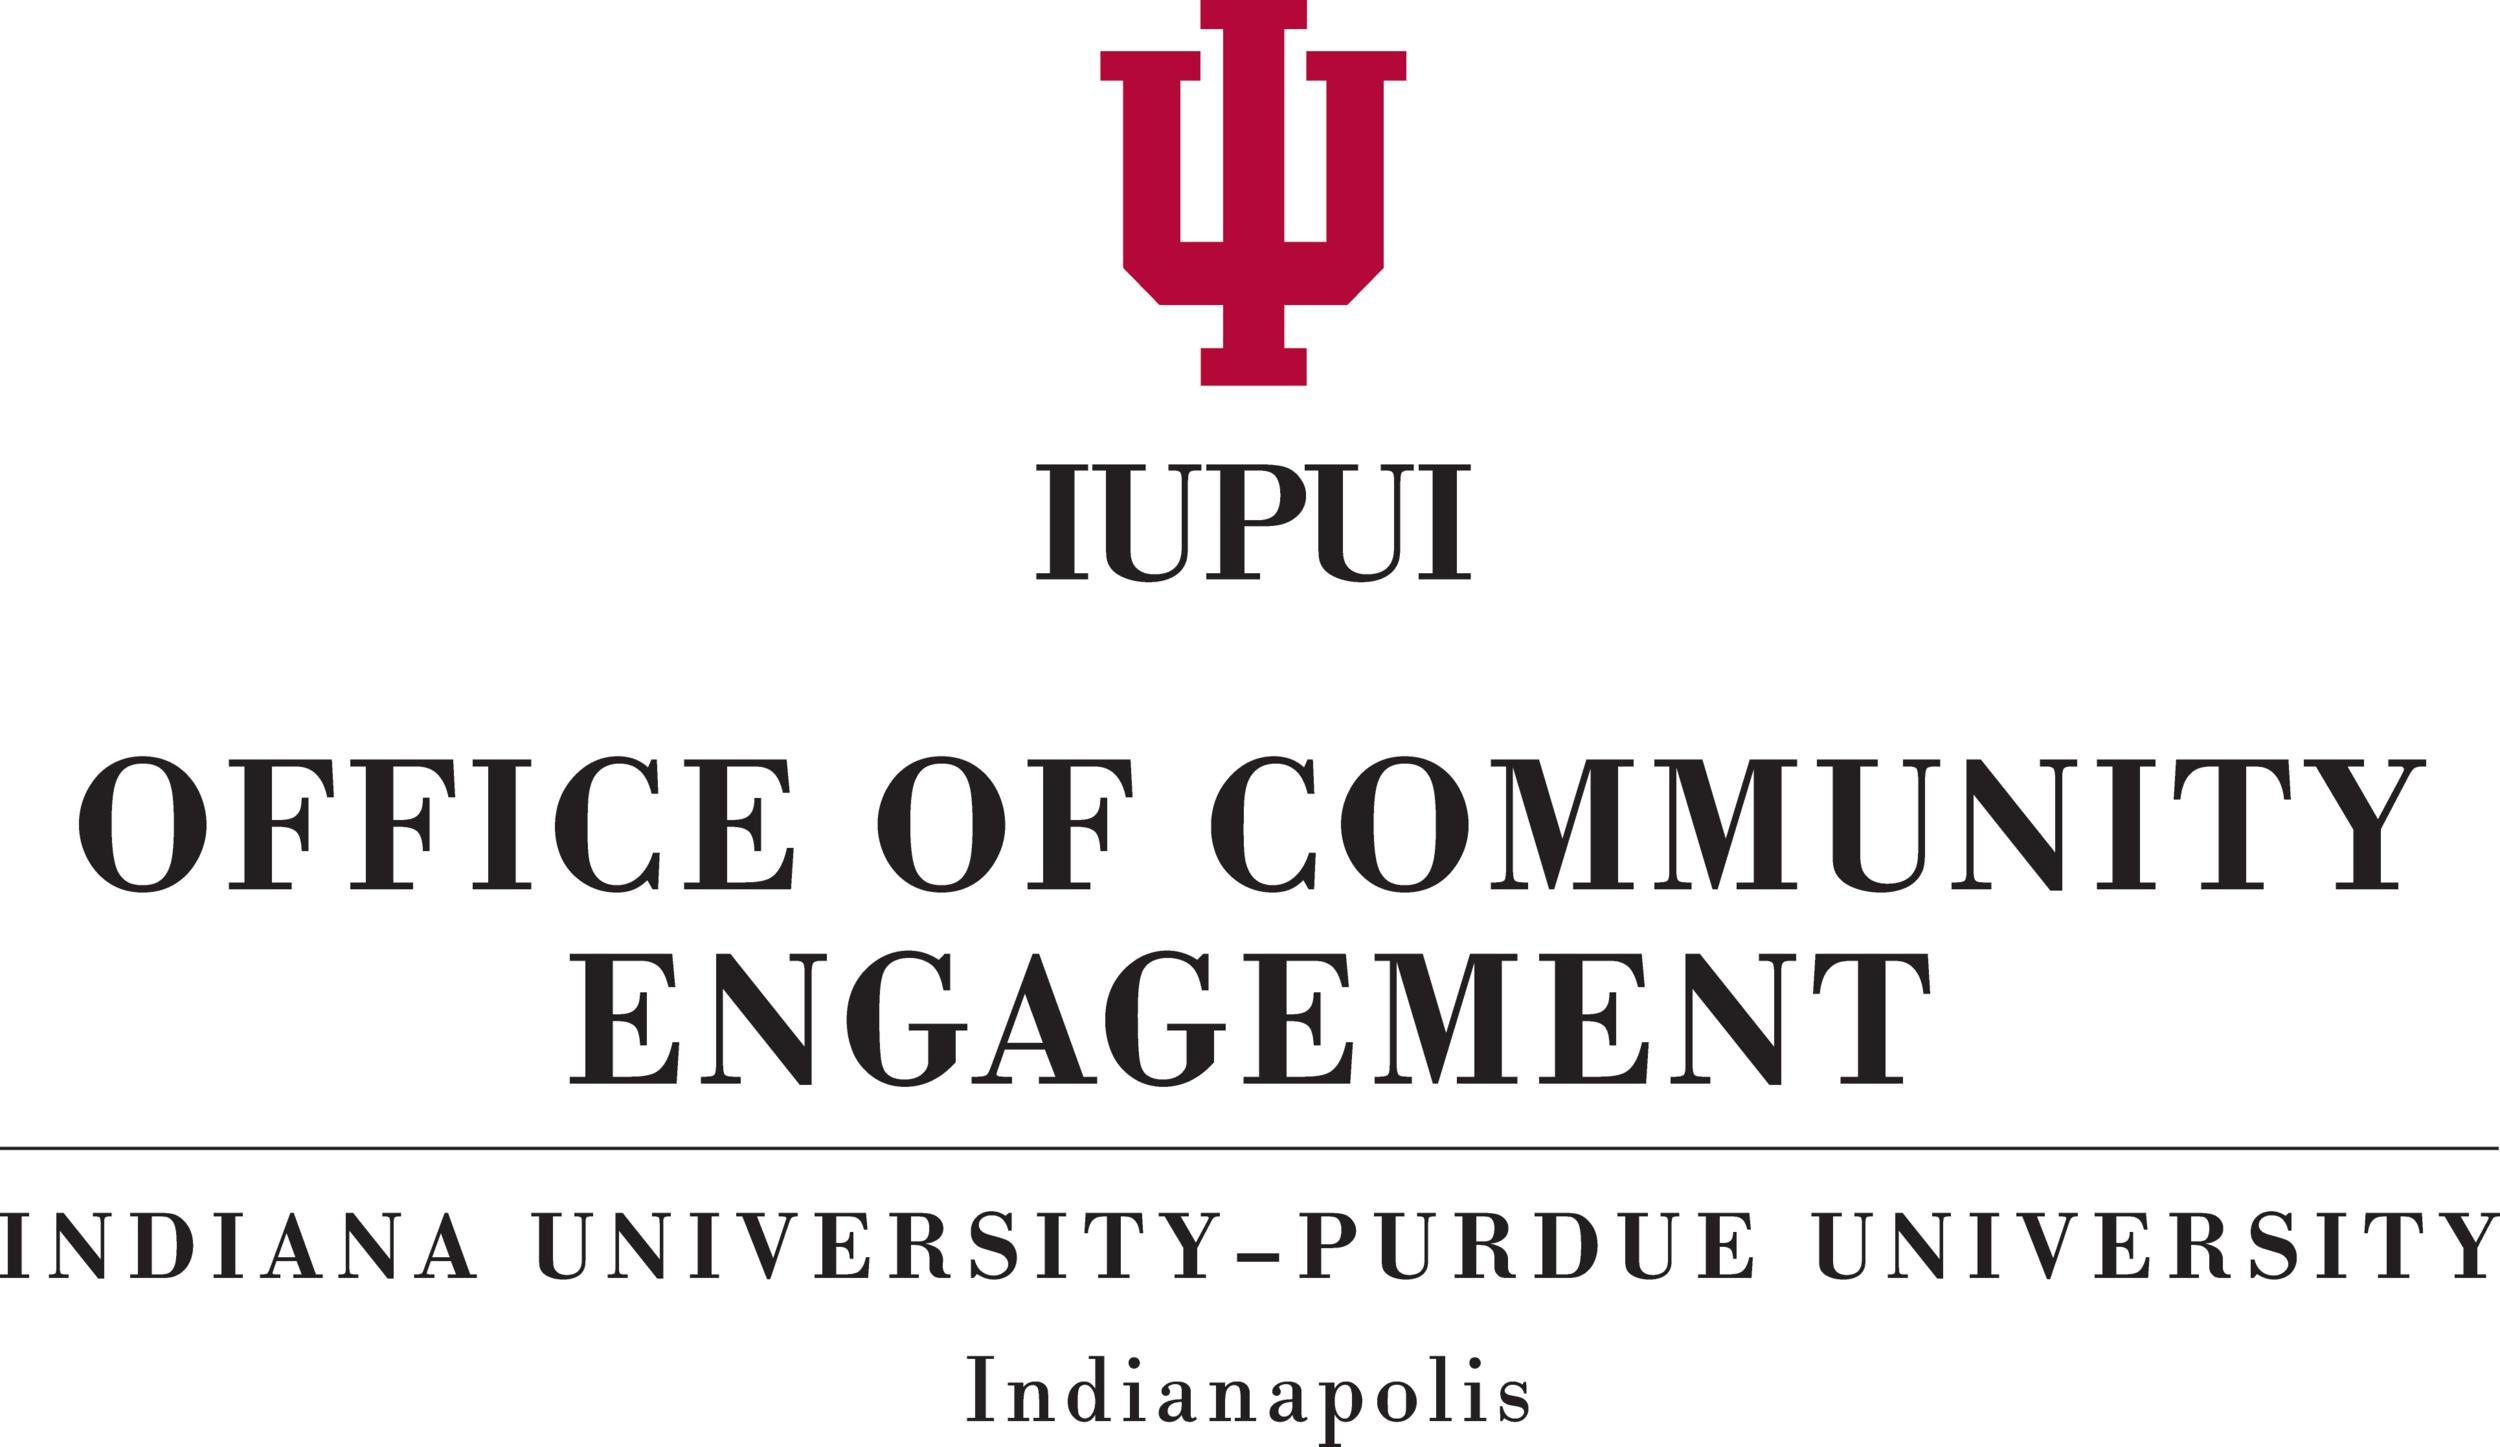 IUPUI Office of Community Engagement logo